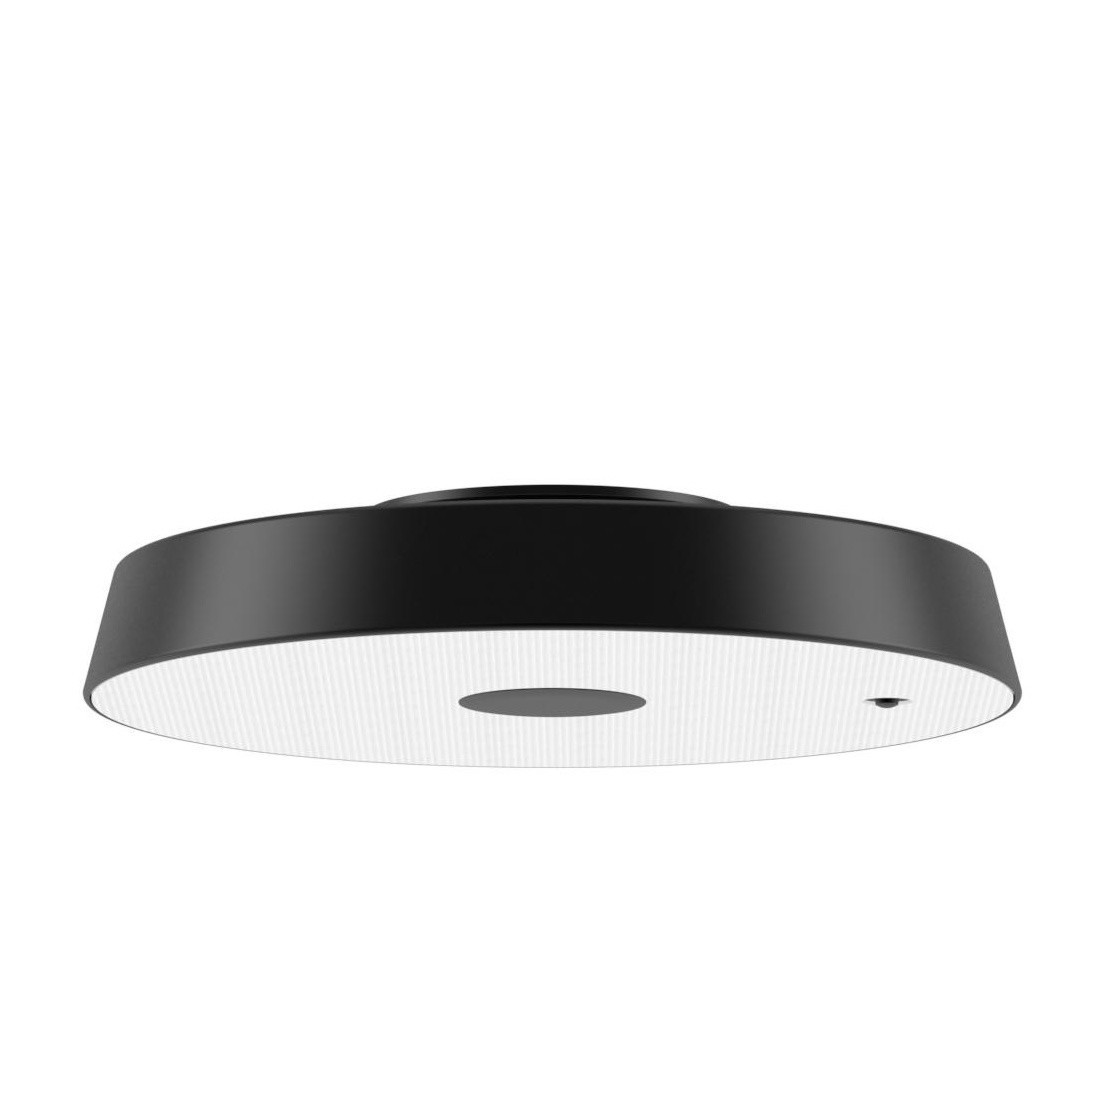 Belux Koi-S LED Ceiling Lamp | AmbienteDirect